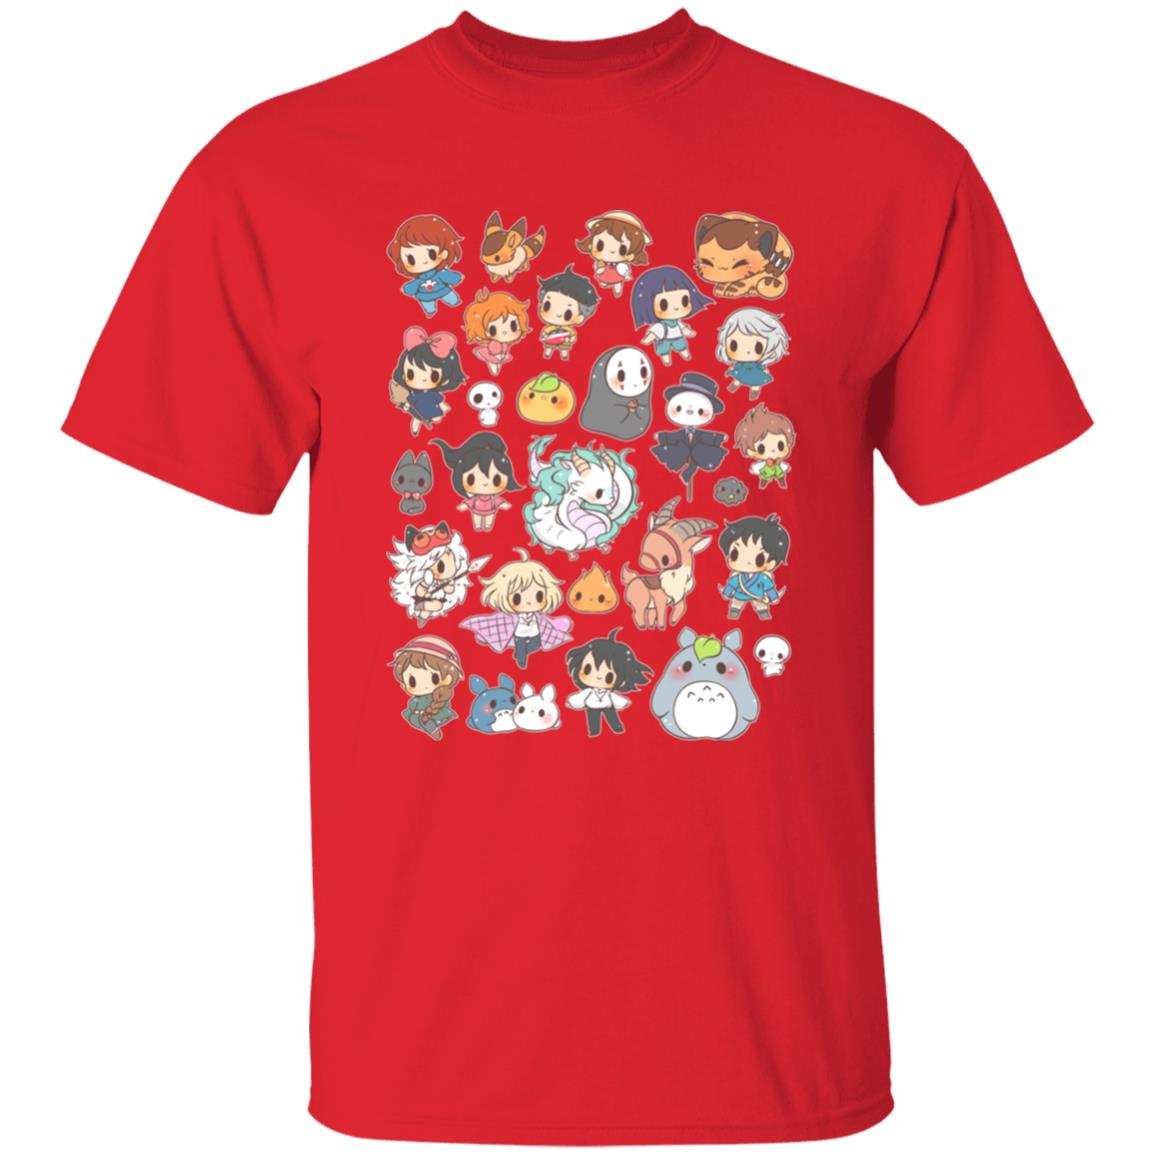 Ghibli Characters Cute Chibi Collection T Shirt